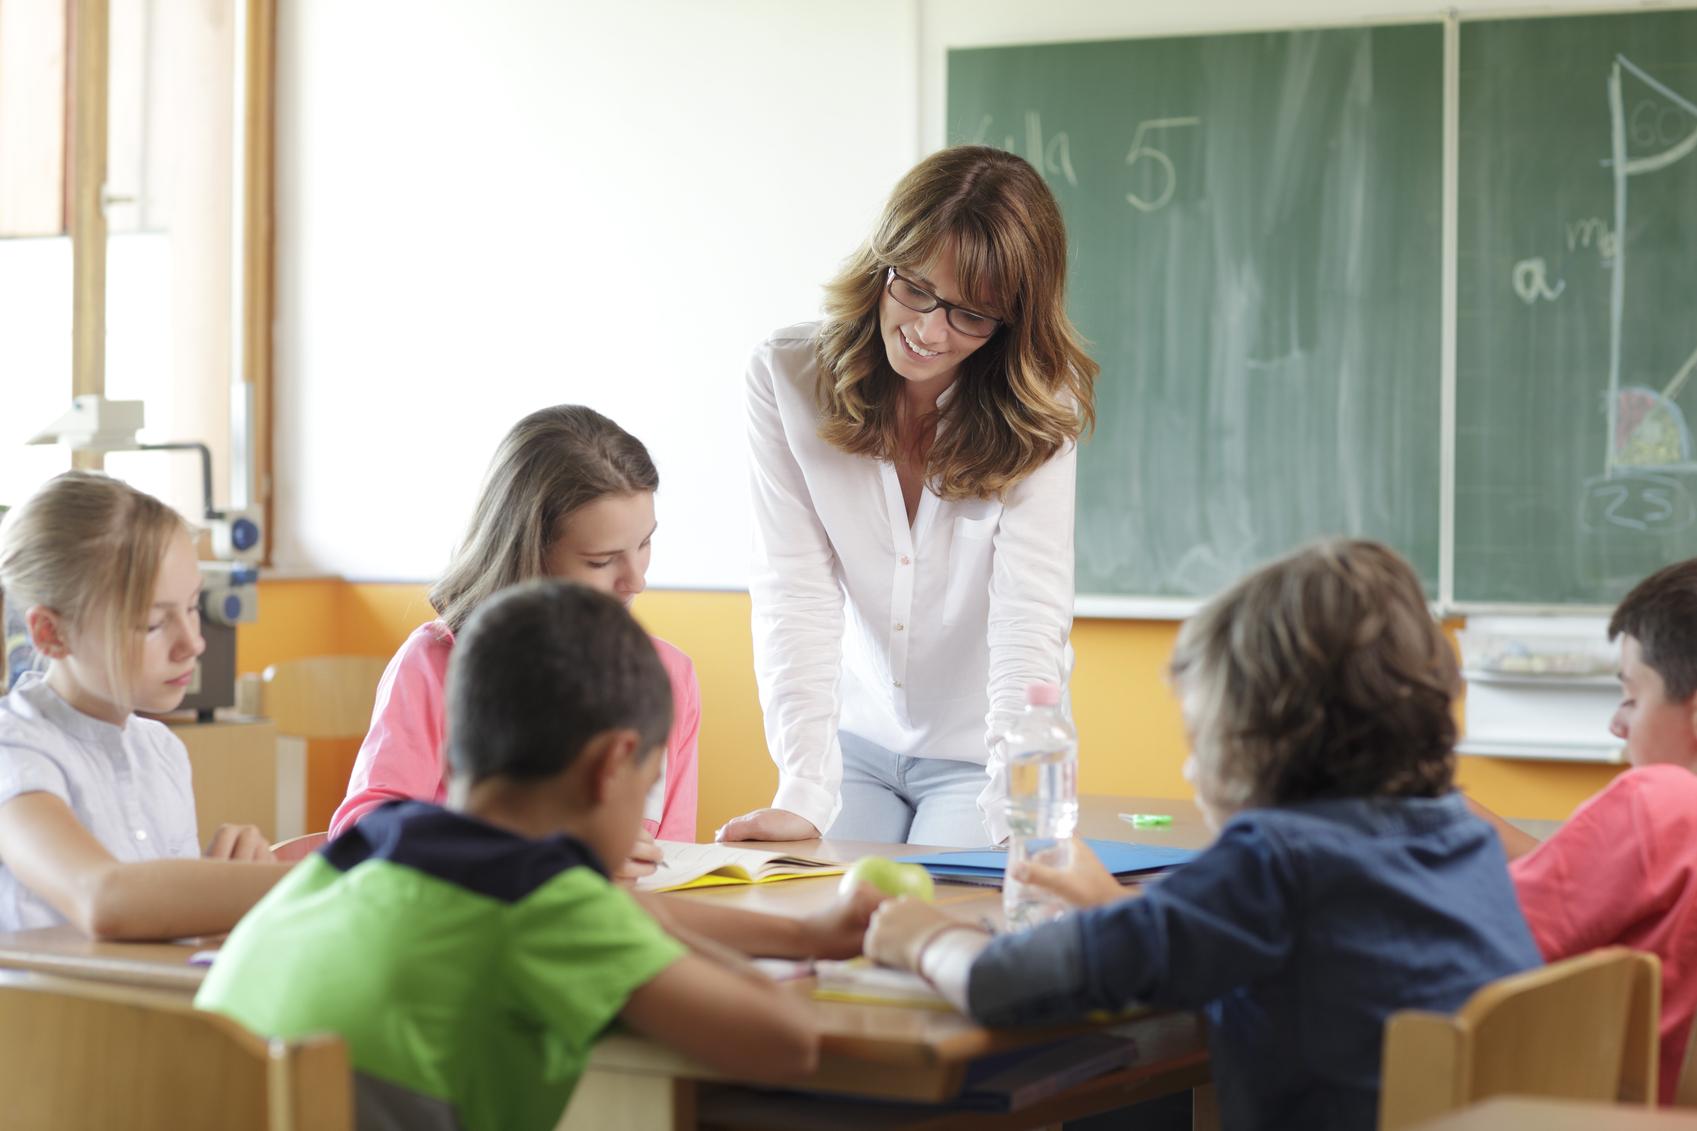 Aprendizaje cooperativo: beneficios